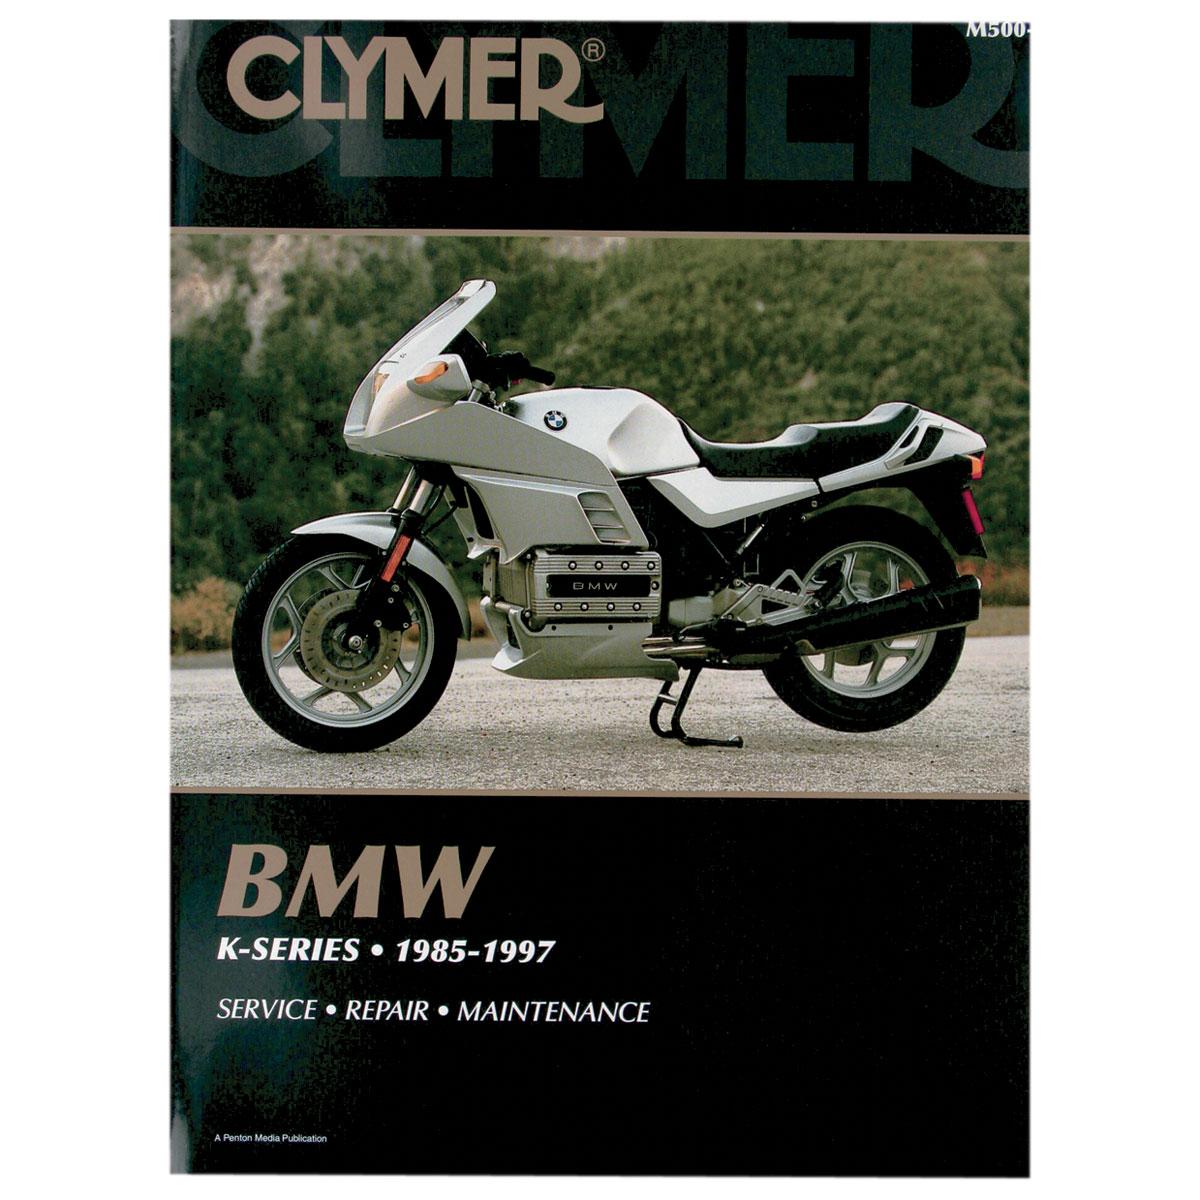 clymer bmw motorcycle repair manual 181 2344 j p cycles rh jpcycles com bmw motorcycle owners manual Electrical Maintenance Manuals